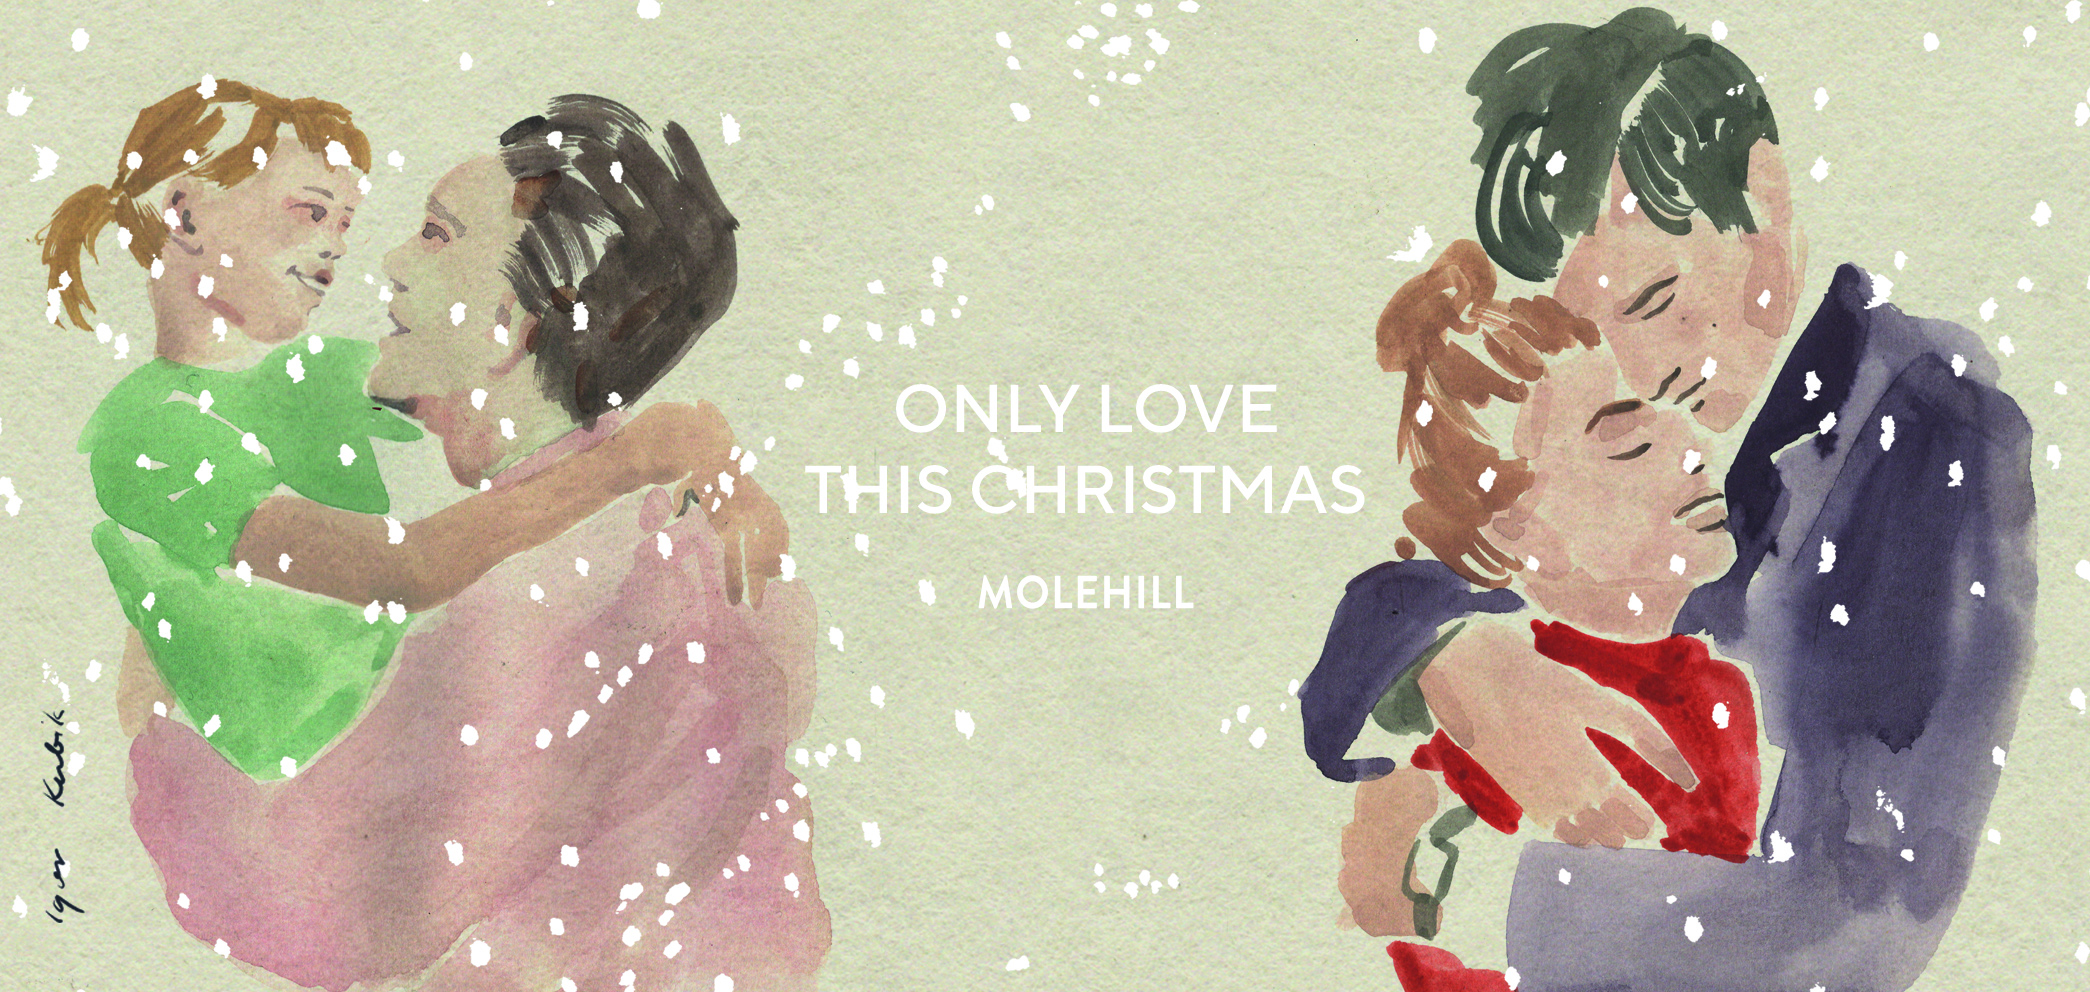 cover-christmas-olehill